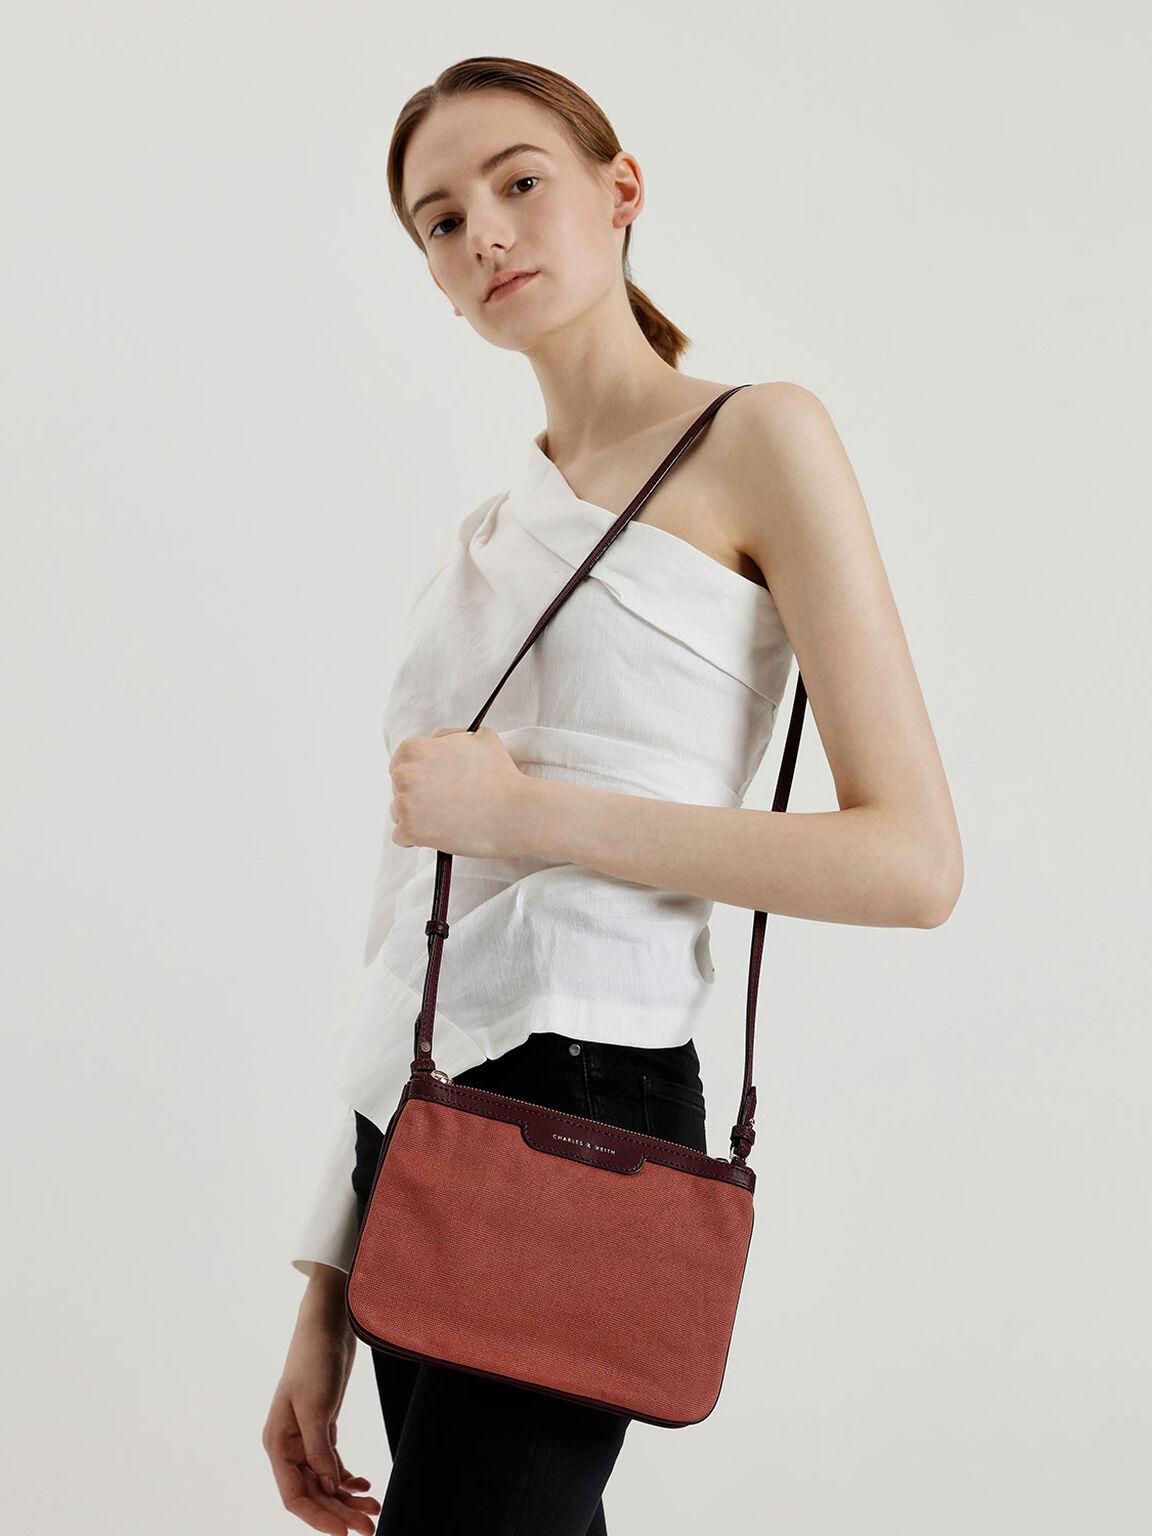 Canvas Crossbody Bag, Burgundy, hi-res